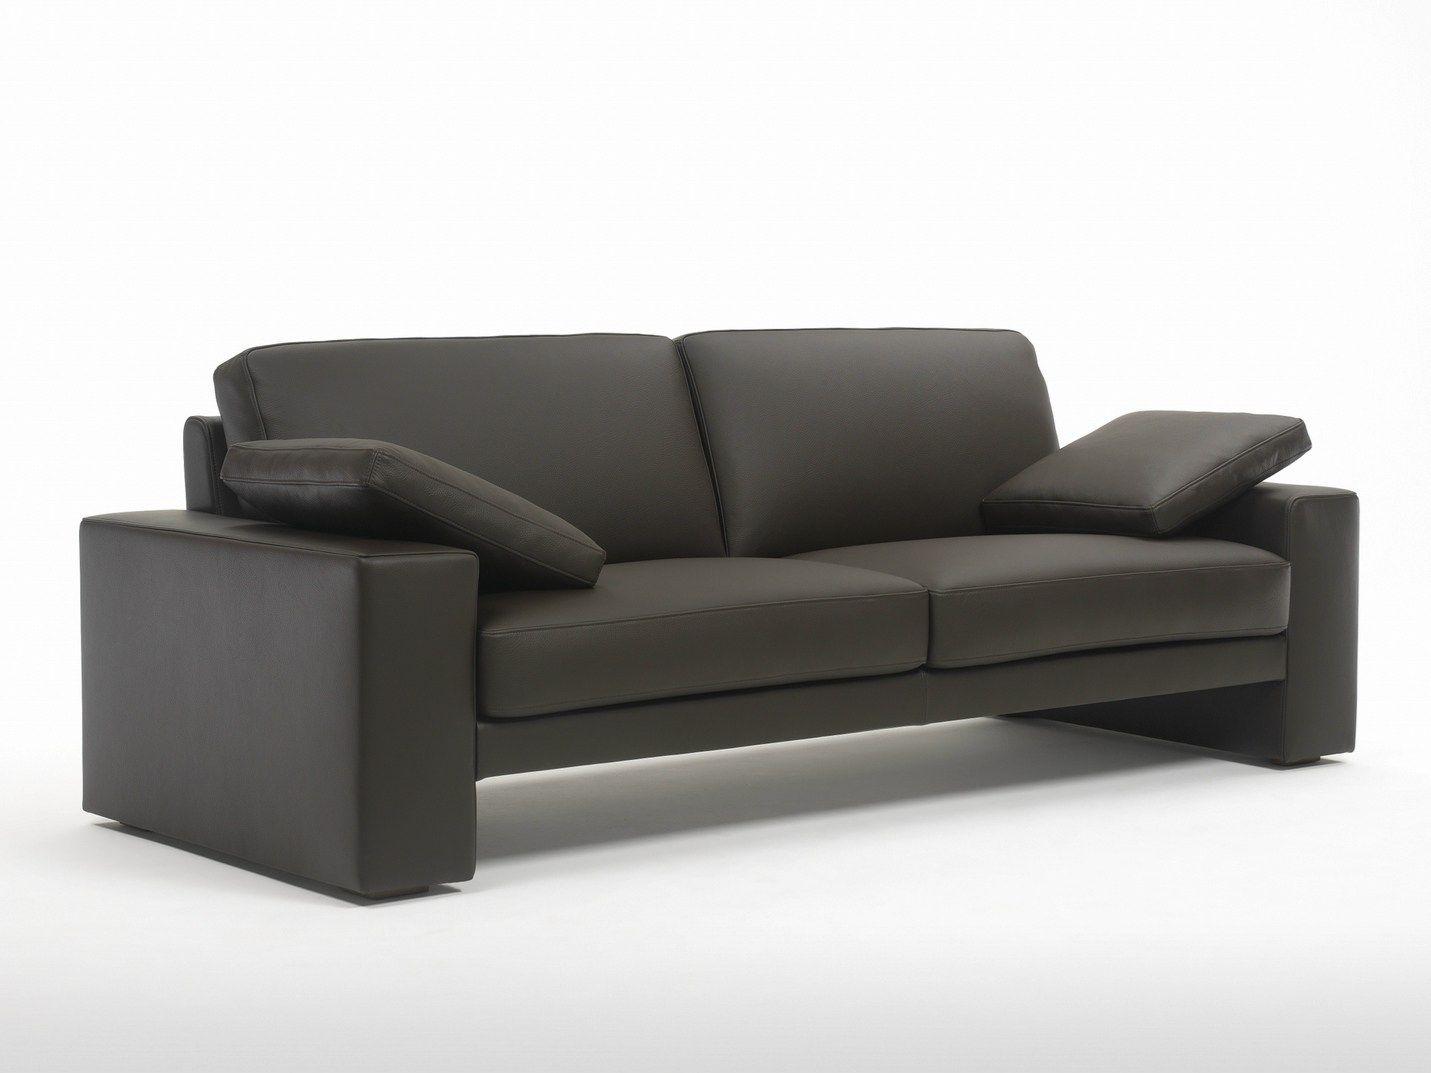 leather sofa puro by giulio marelli italia design r d. Black Bedroom Furniture Sets. Home Design Ideas